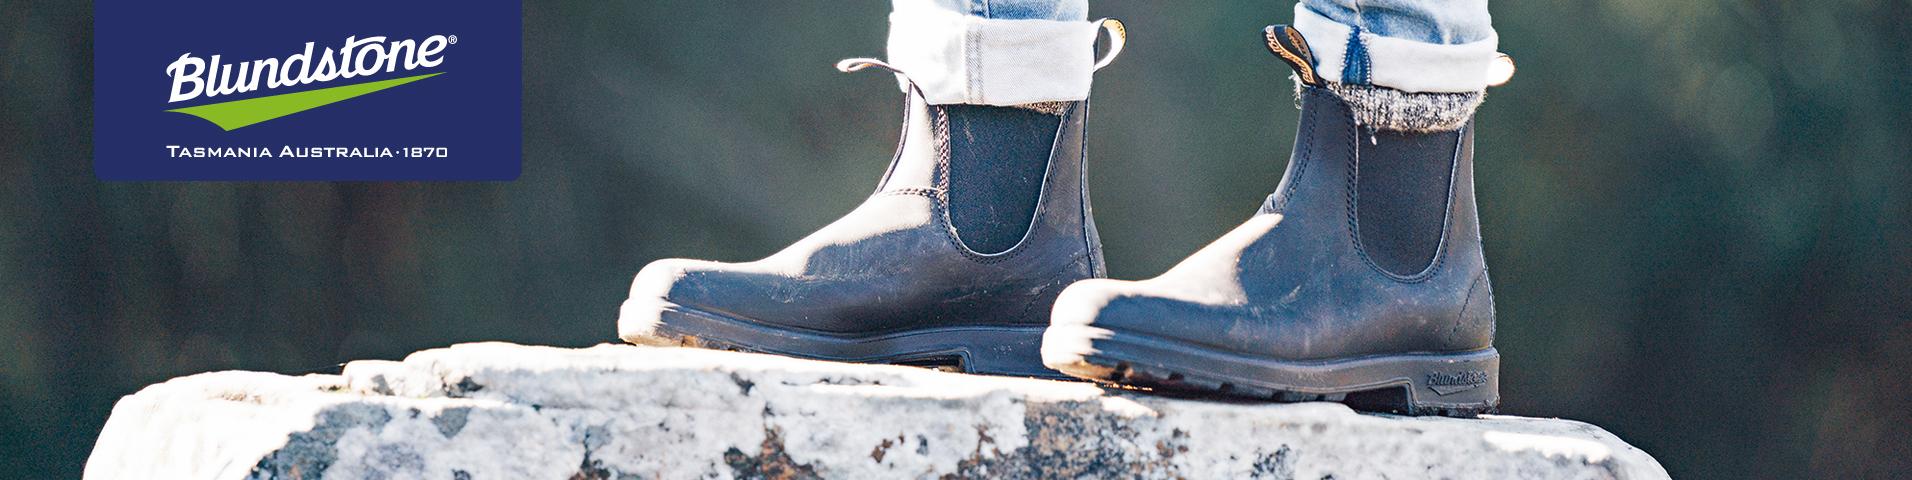 Australien Blundstone Schuhe Boot Pink Schuh Australien